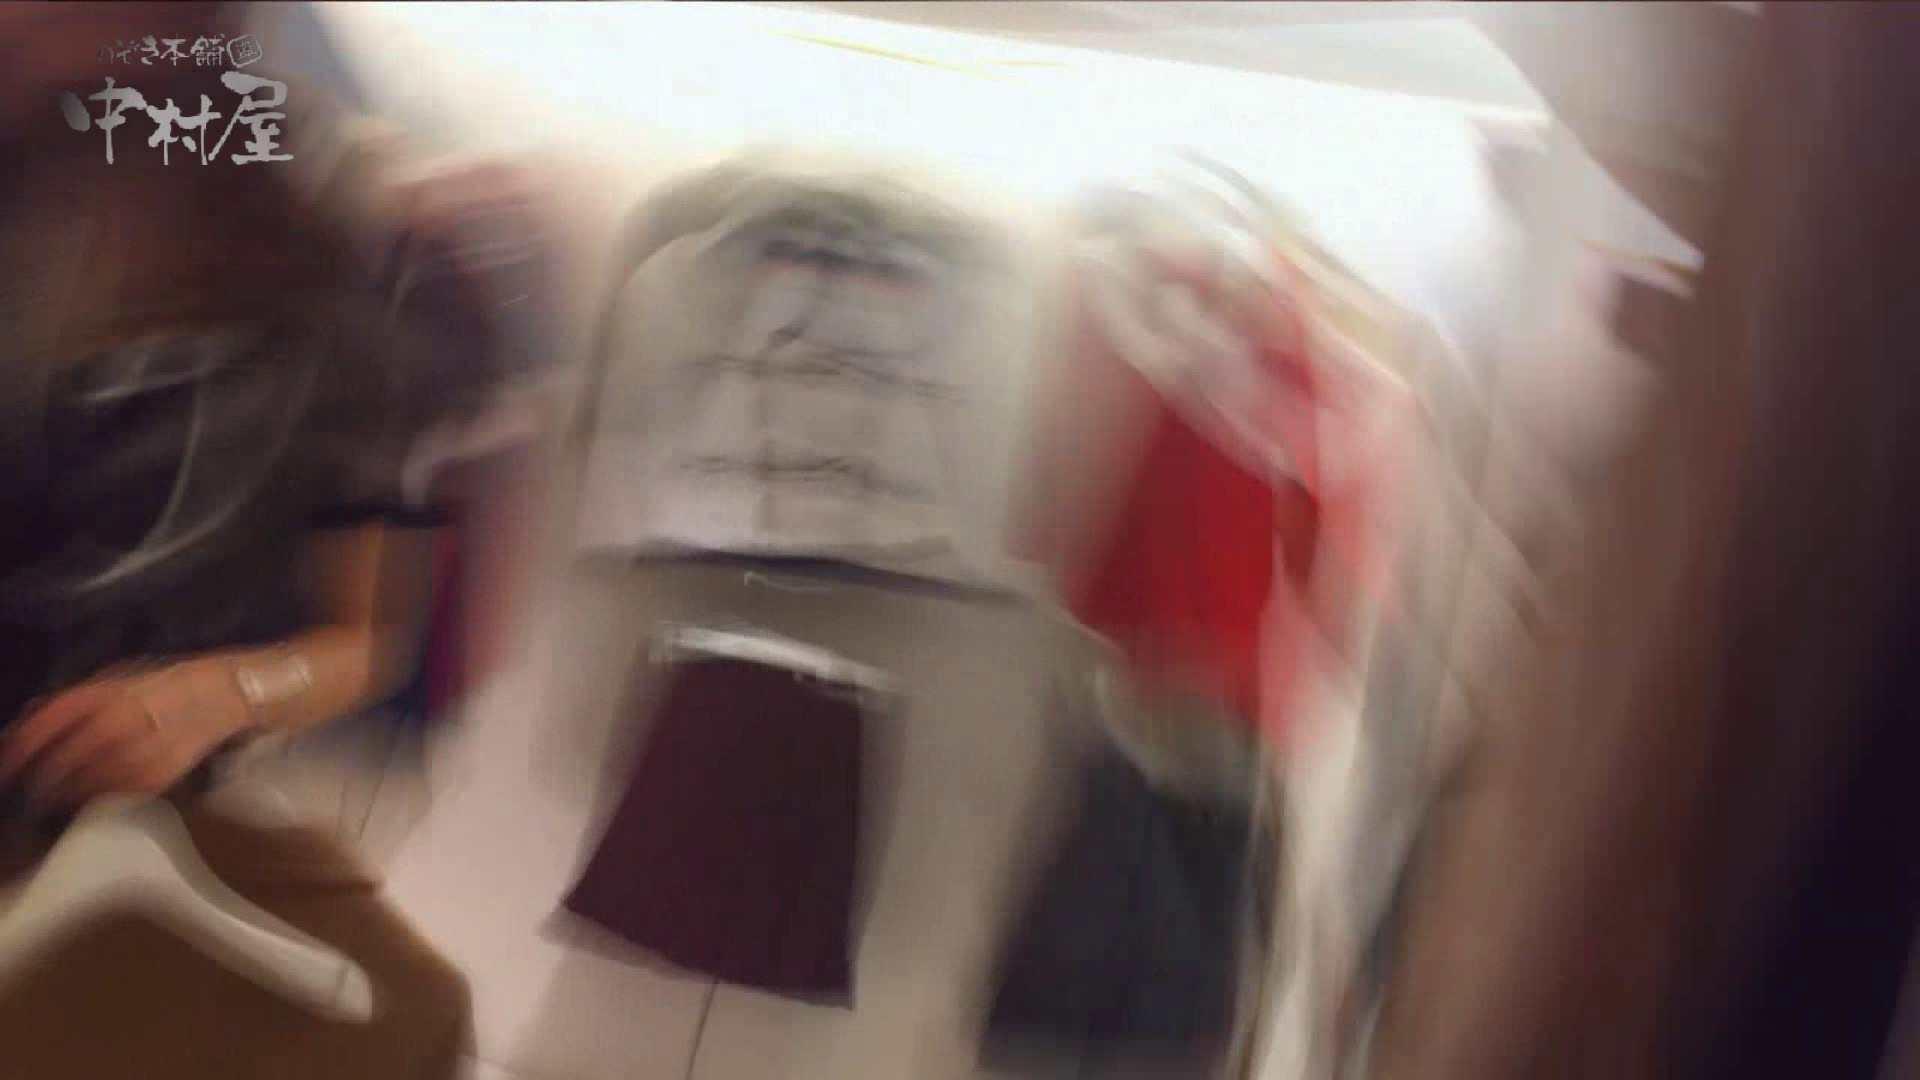 vol.69 美人アパレル胸チラ&パンチラ ストライプパンツみっけ! パンチラ | OLのエロ生活  95連発 11